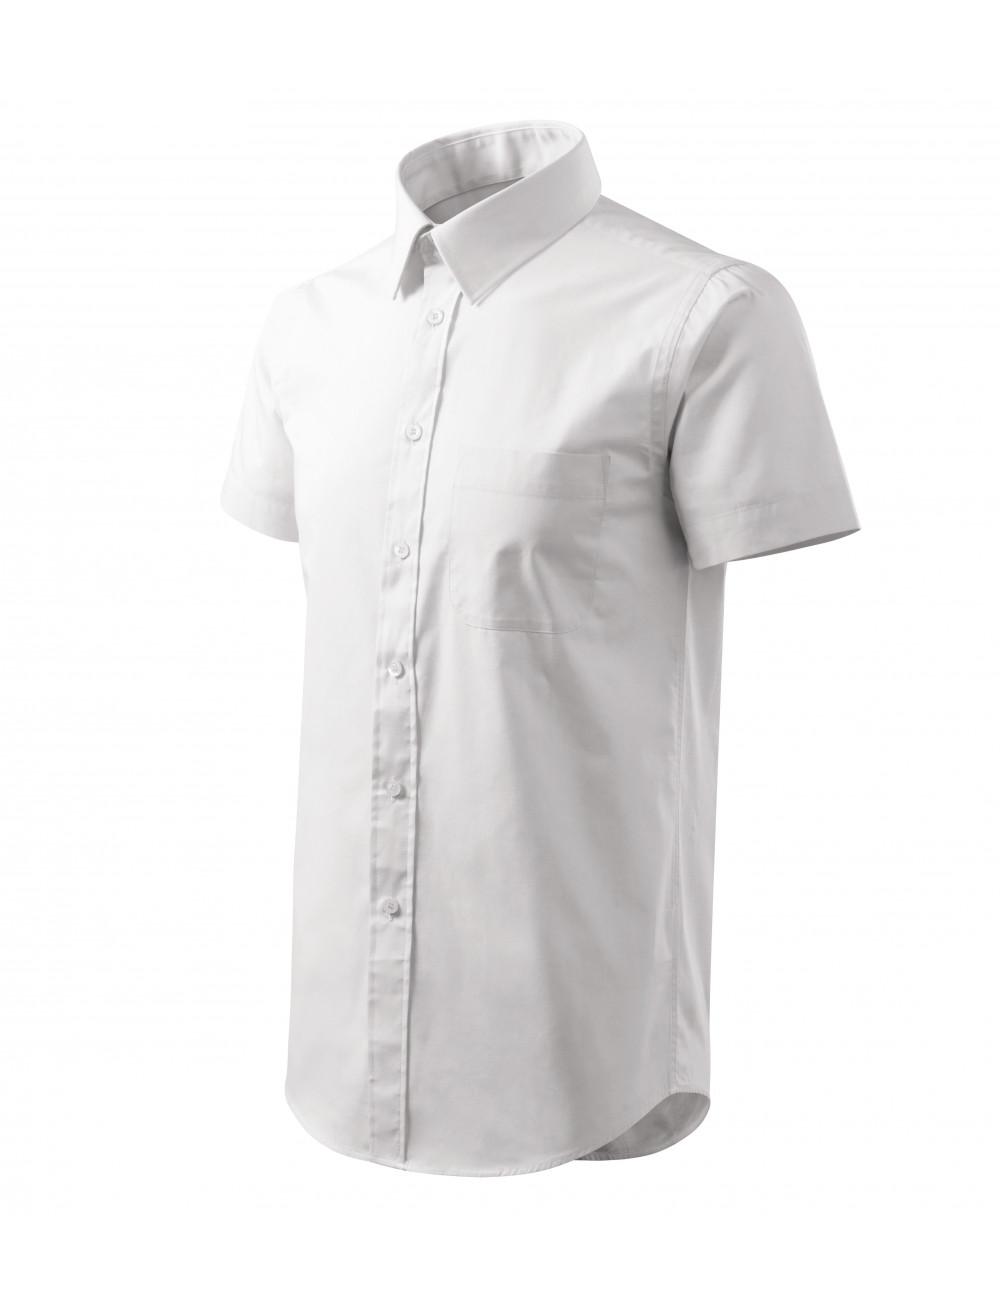 Adler MALFINI Koszula męska Chic 207 biały